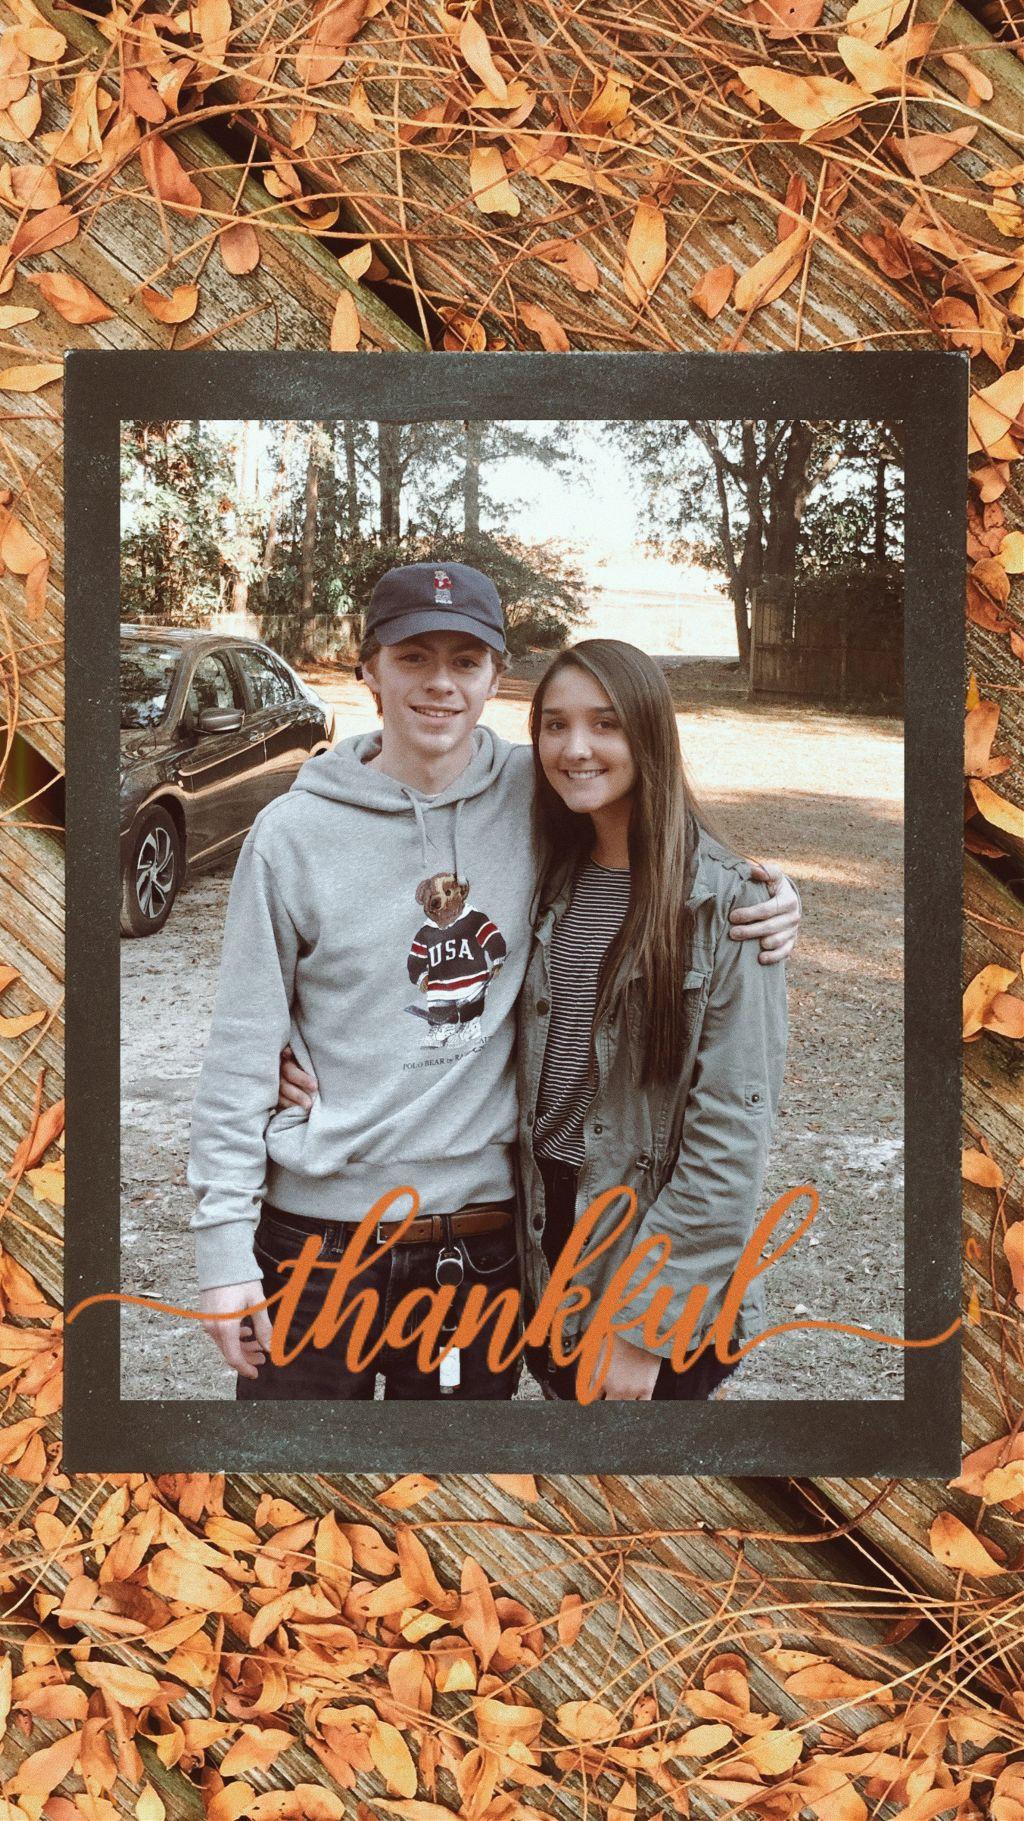 #freetoedit #thankful #boyfriend #thanksgiving #thanksgivingedit #remix #picsart #replay #photography #leaves #portrait #thanksgivingedit #edit #holidayedit #frame